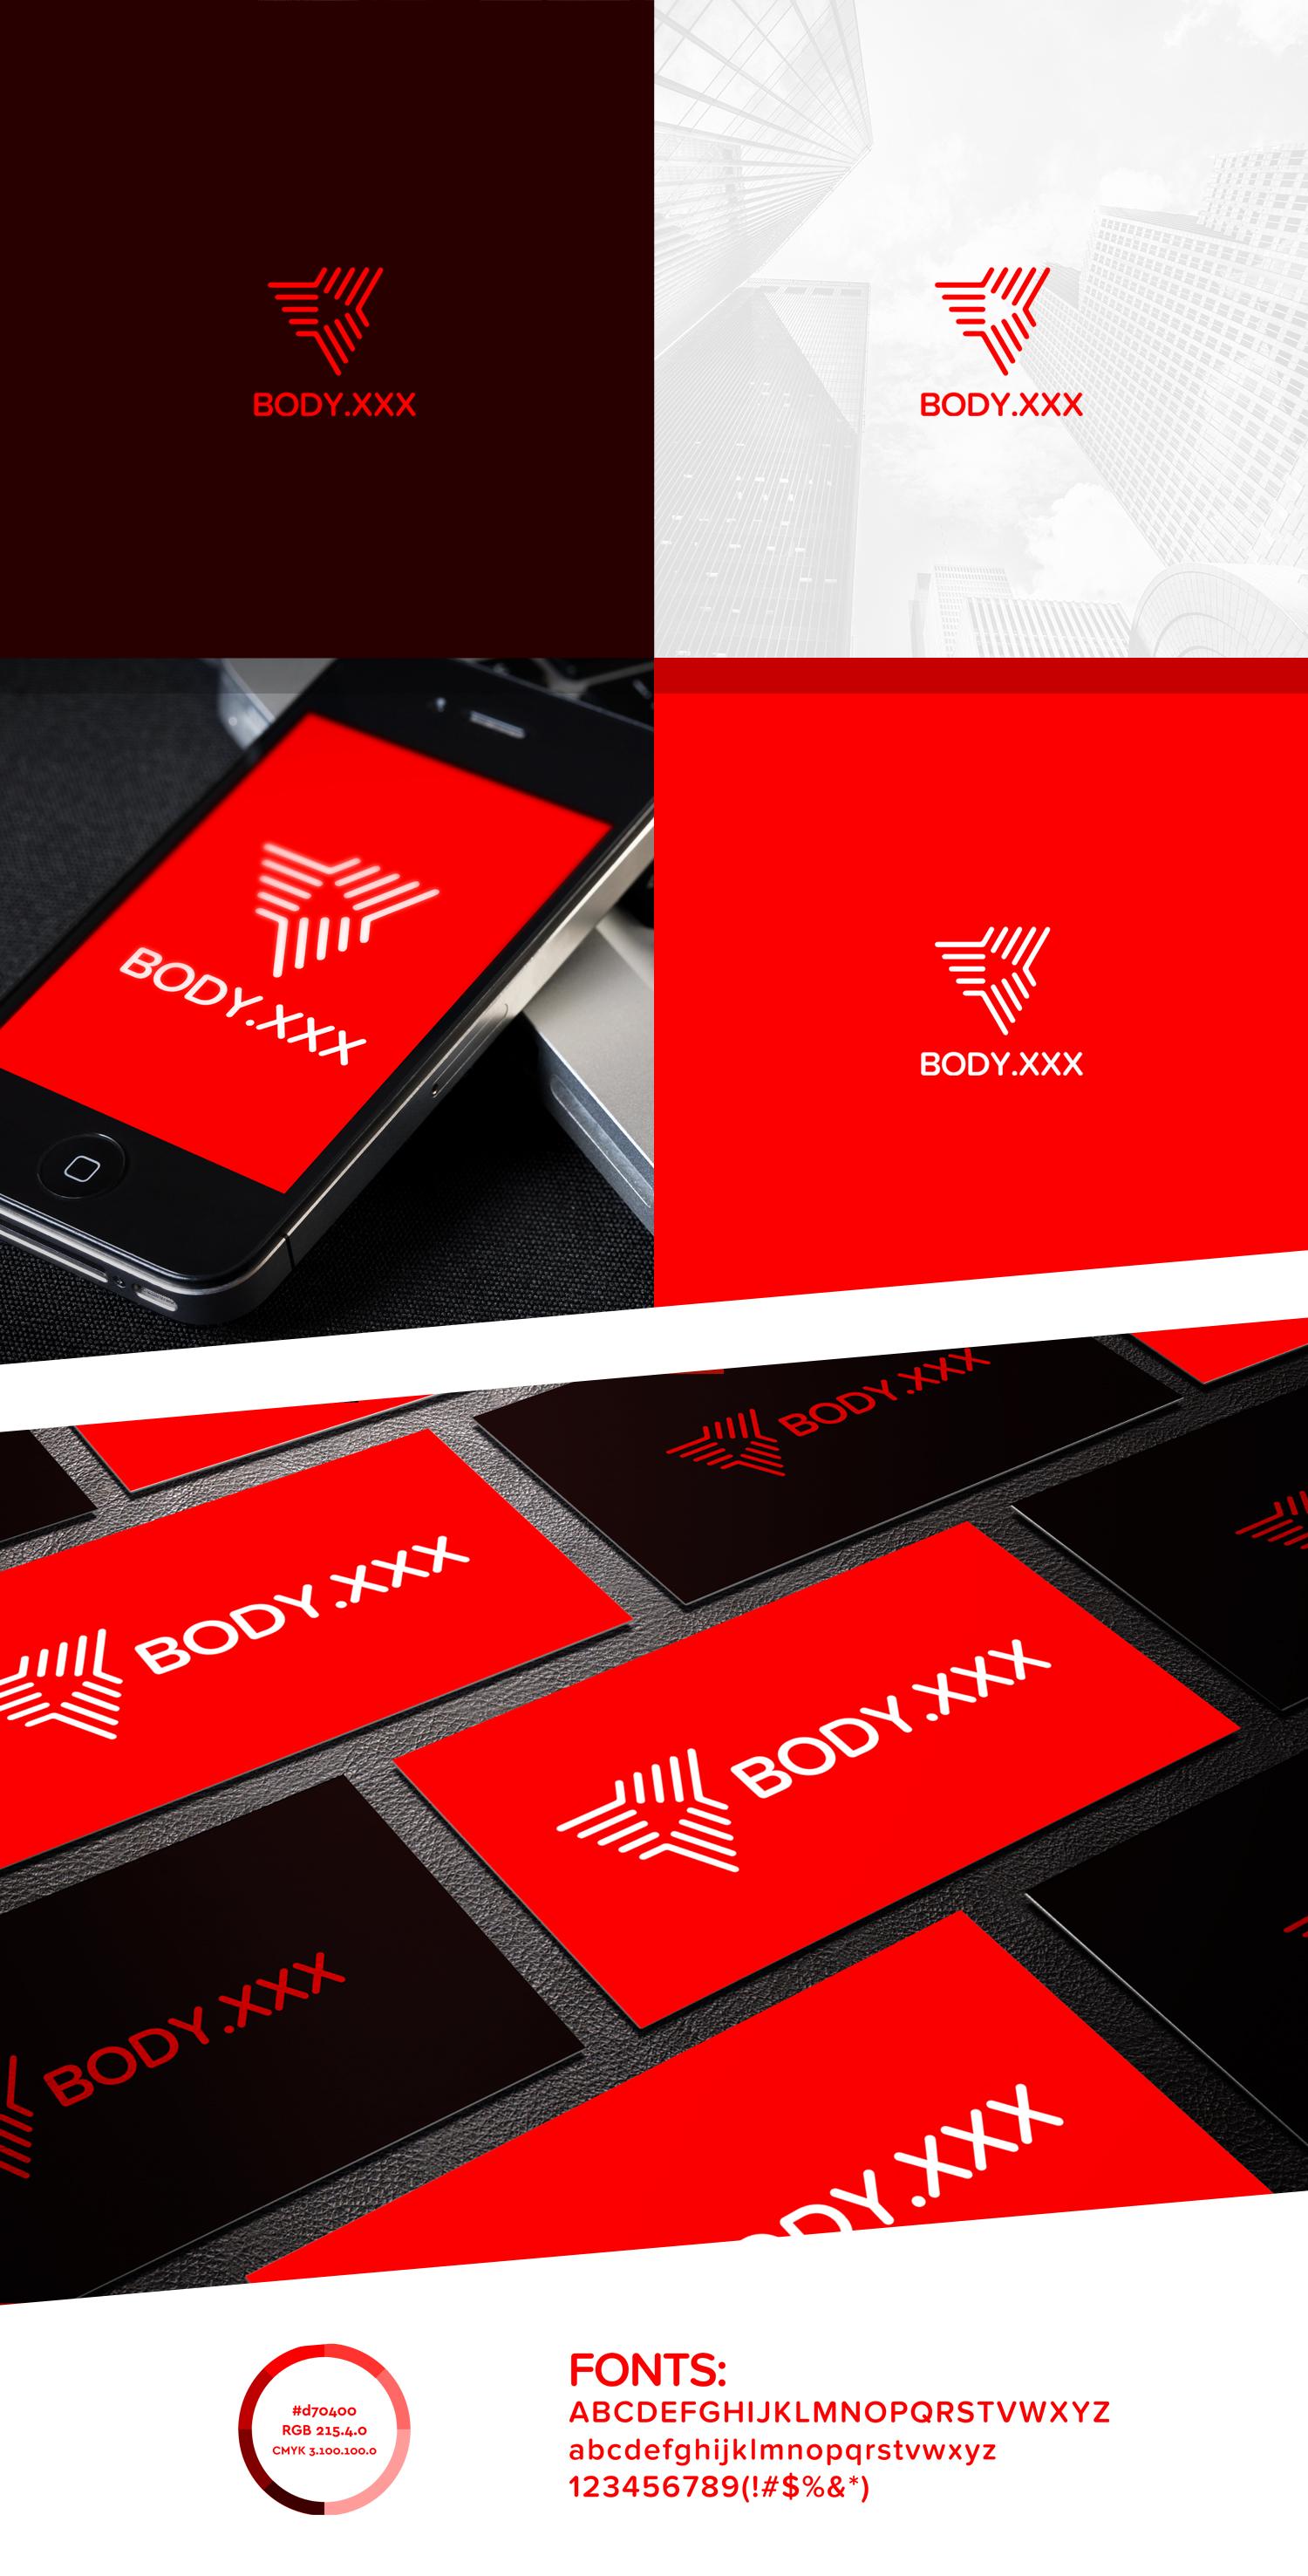 Разработка логотипа (видеоблог для моделей) фото f_2175b1ed06c4a3ae.jpg